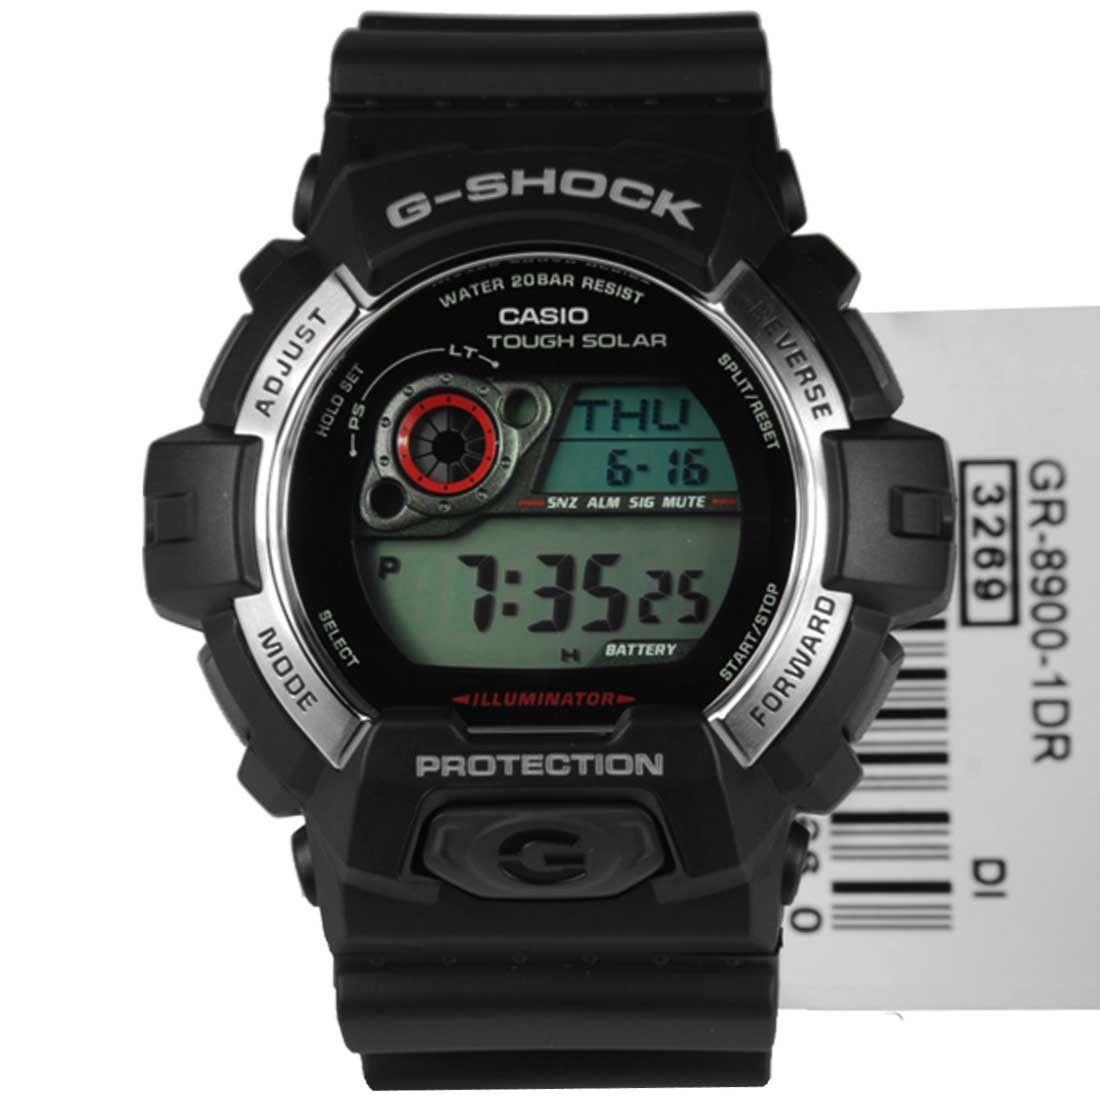 Casio G Shock Tough Solar Watch GR 8900 1 GR8900 Special